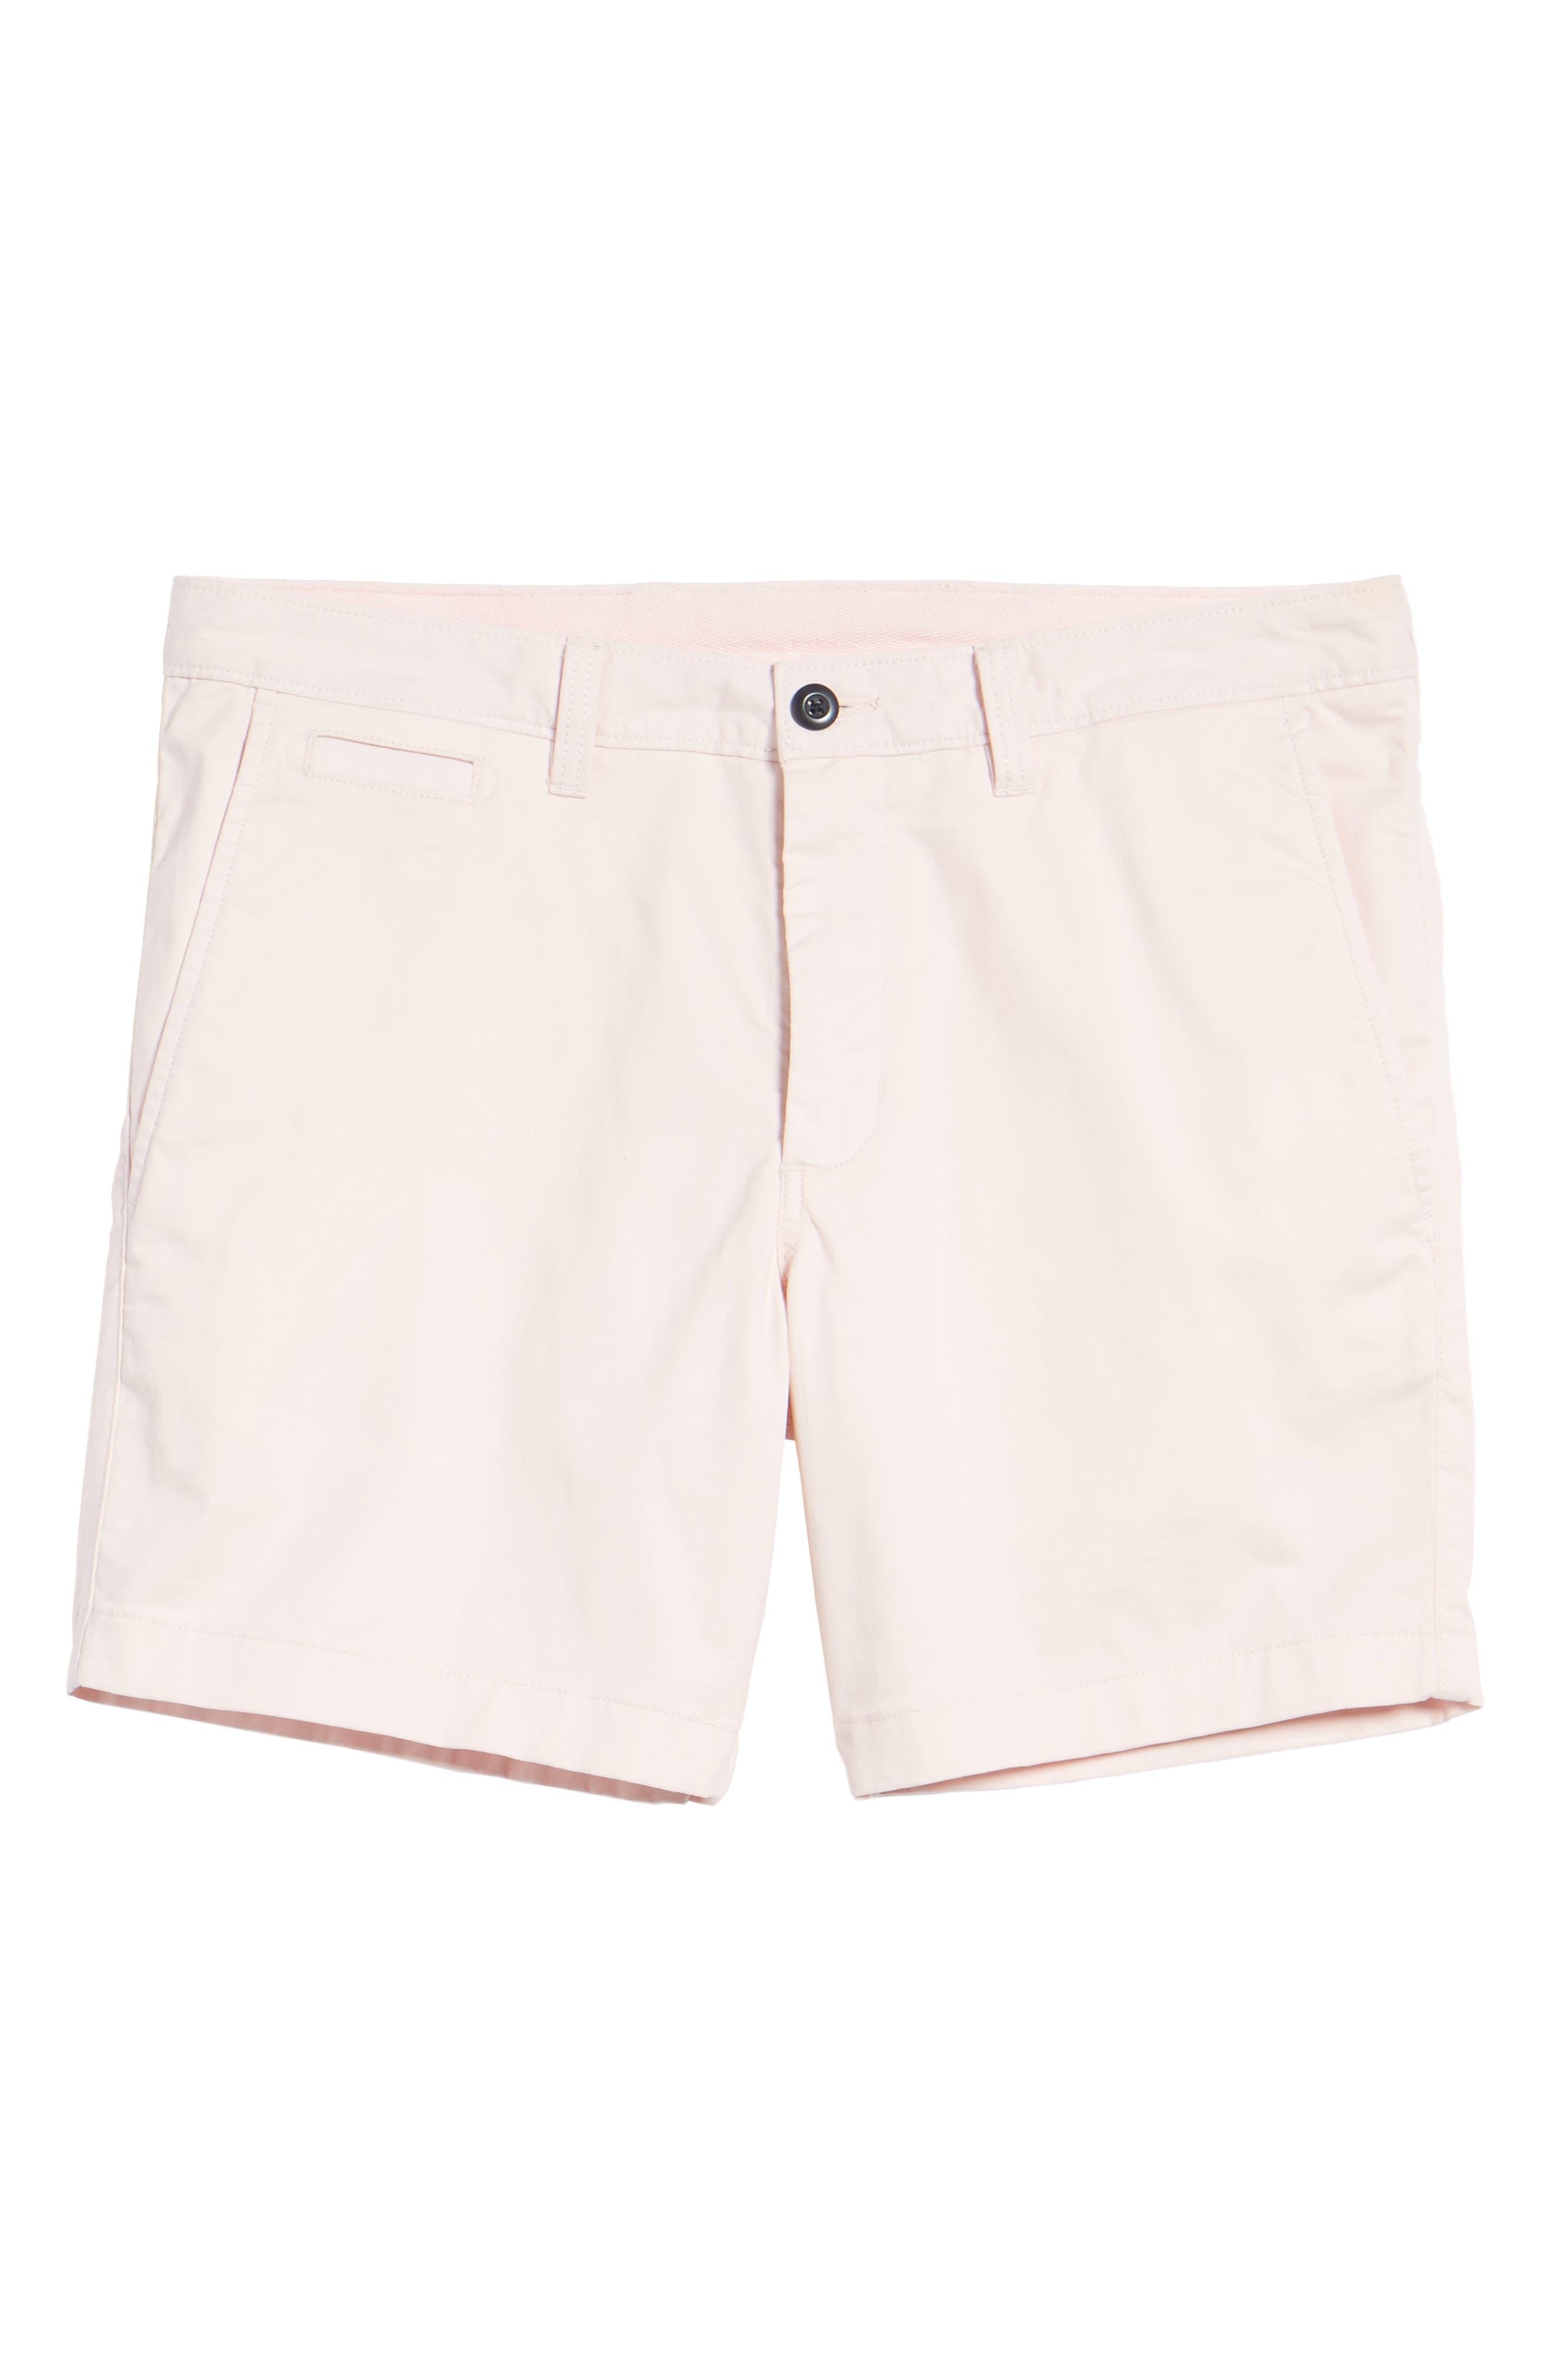 Ballard Slim Fit Stretch Chino 7-Inch Shorts,                             Alternate thumbnail 72, color,